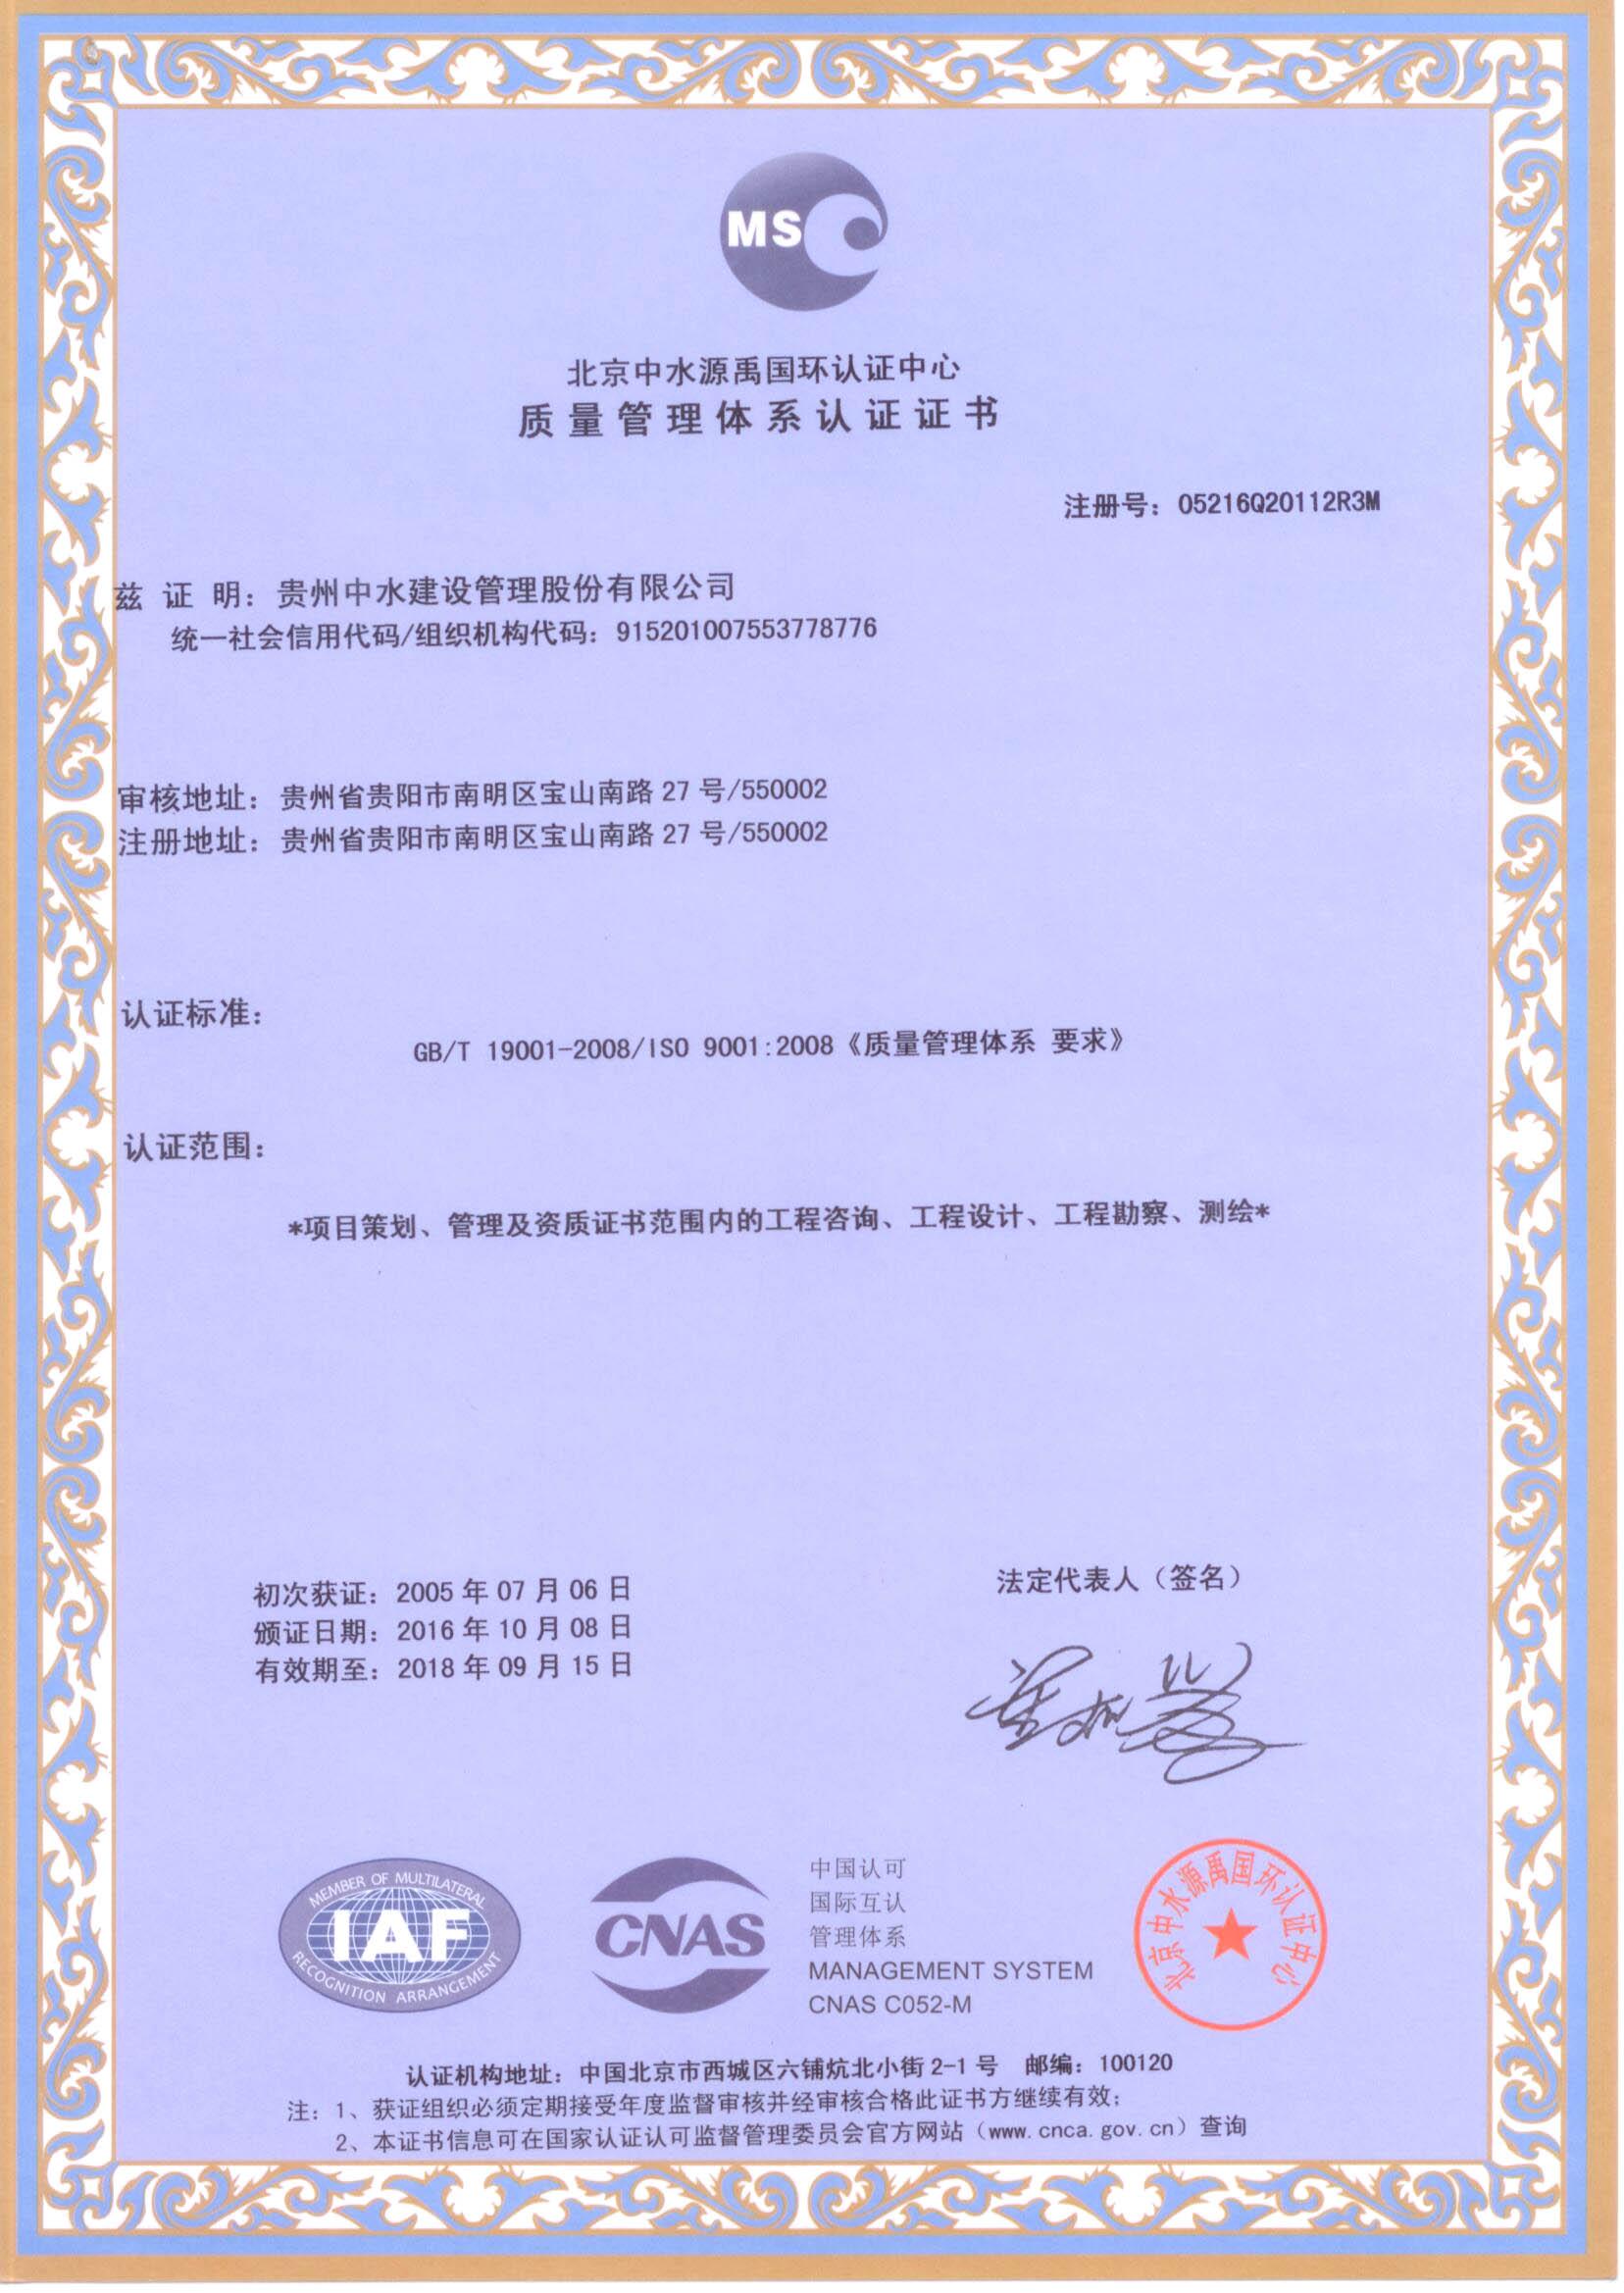 <span>2016年中水质量体系认证</span>